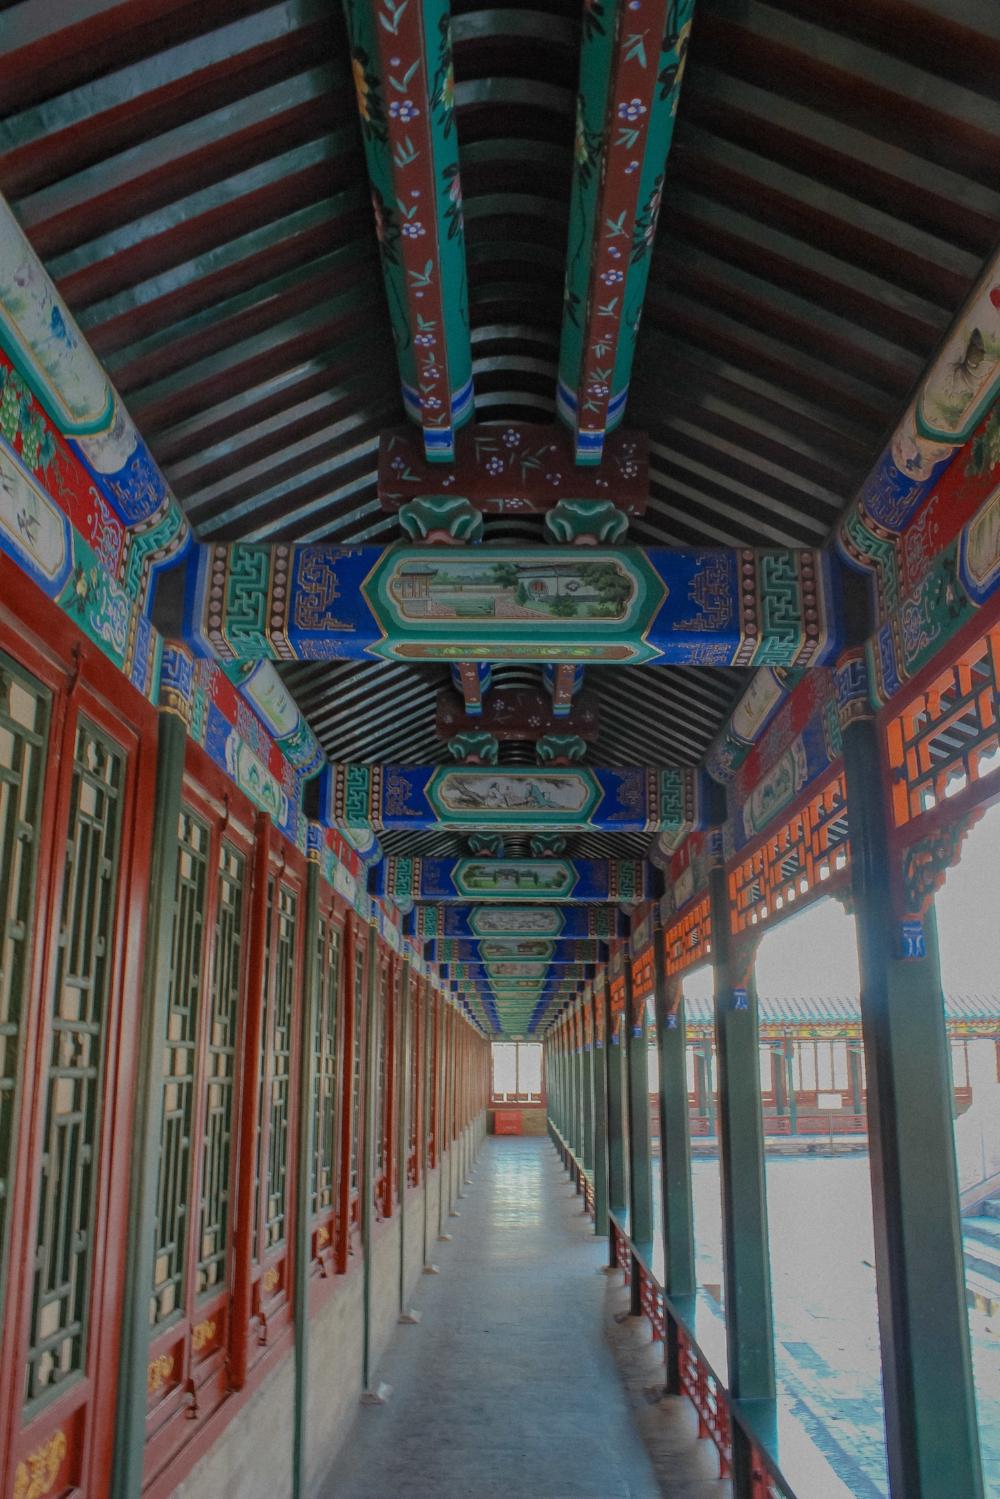 curio.trips.china.beijing.red.temple.walkway.jpg